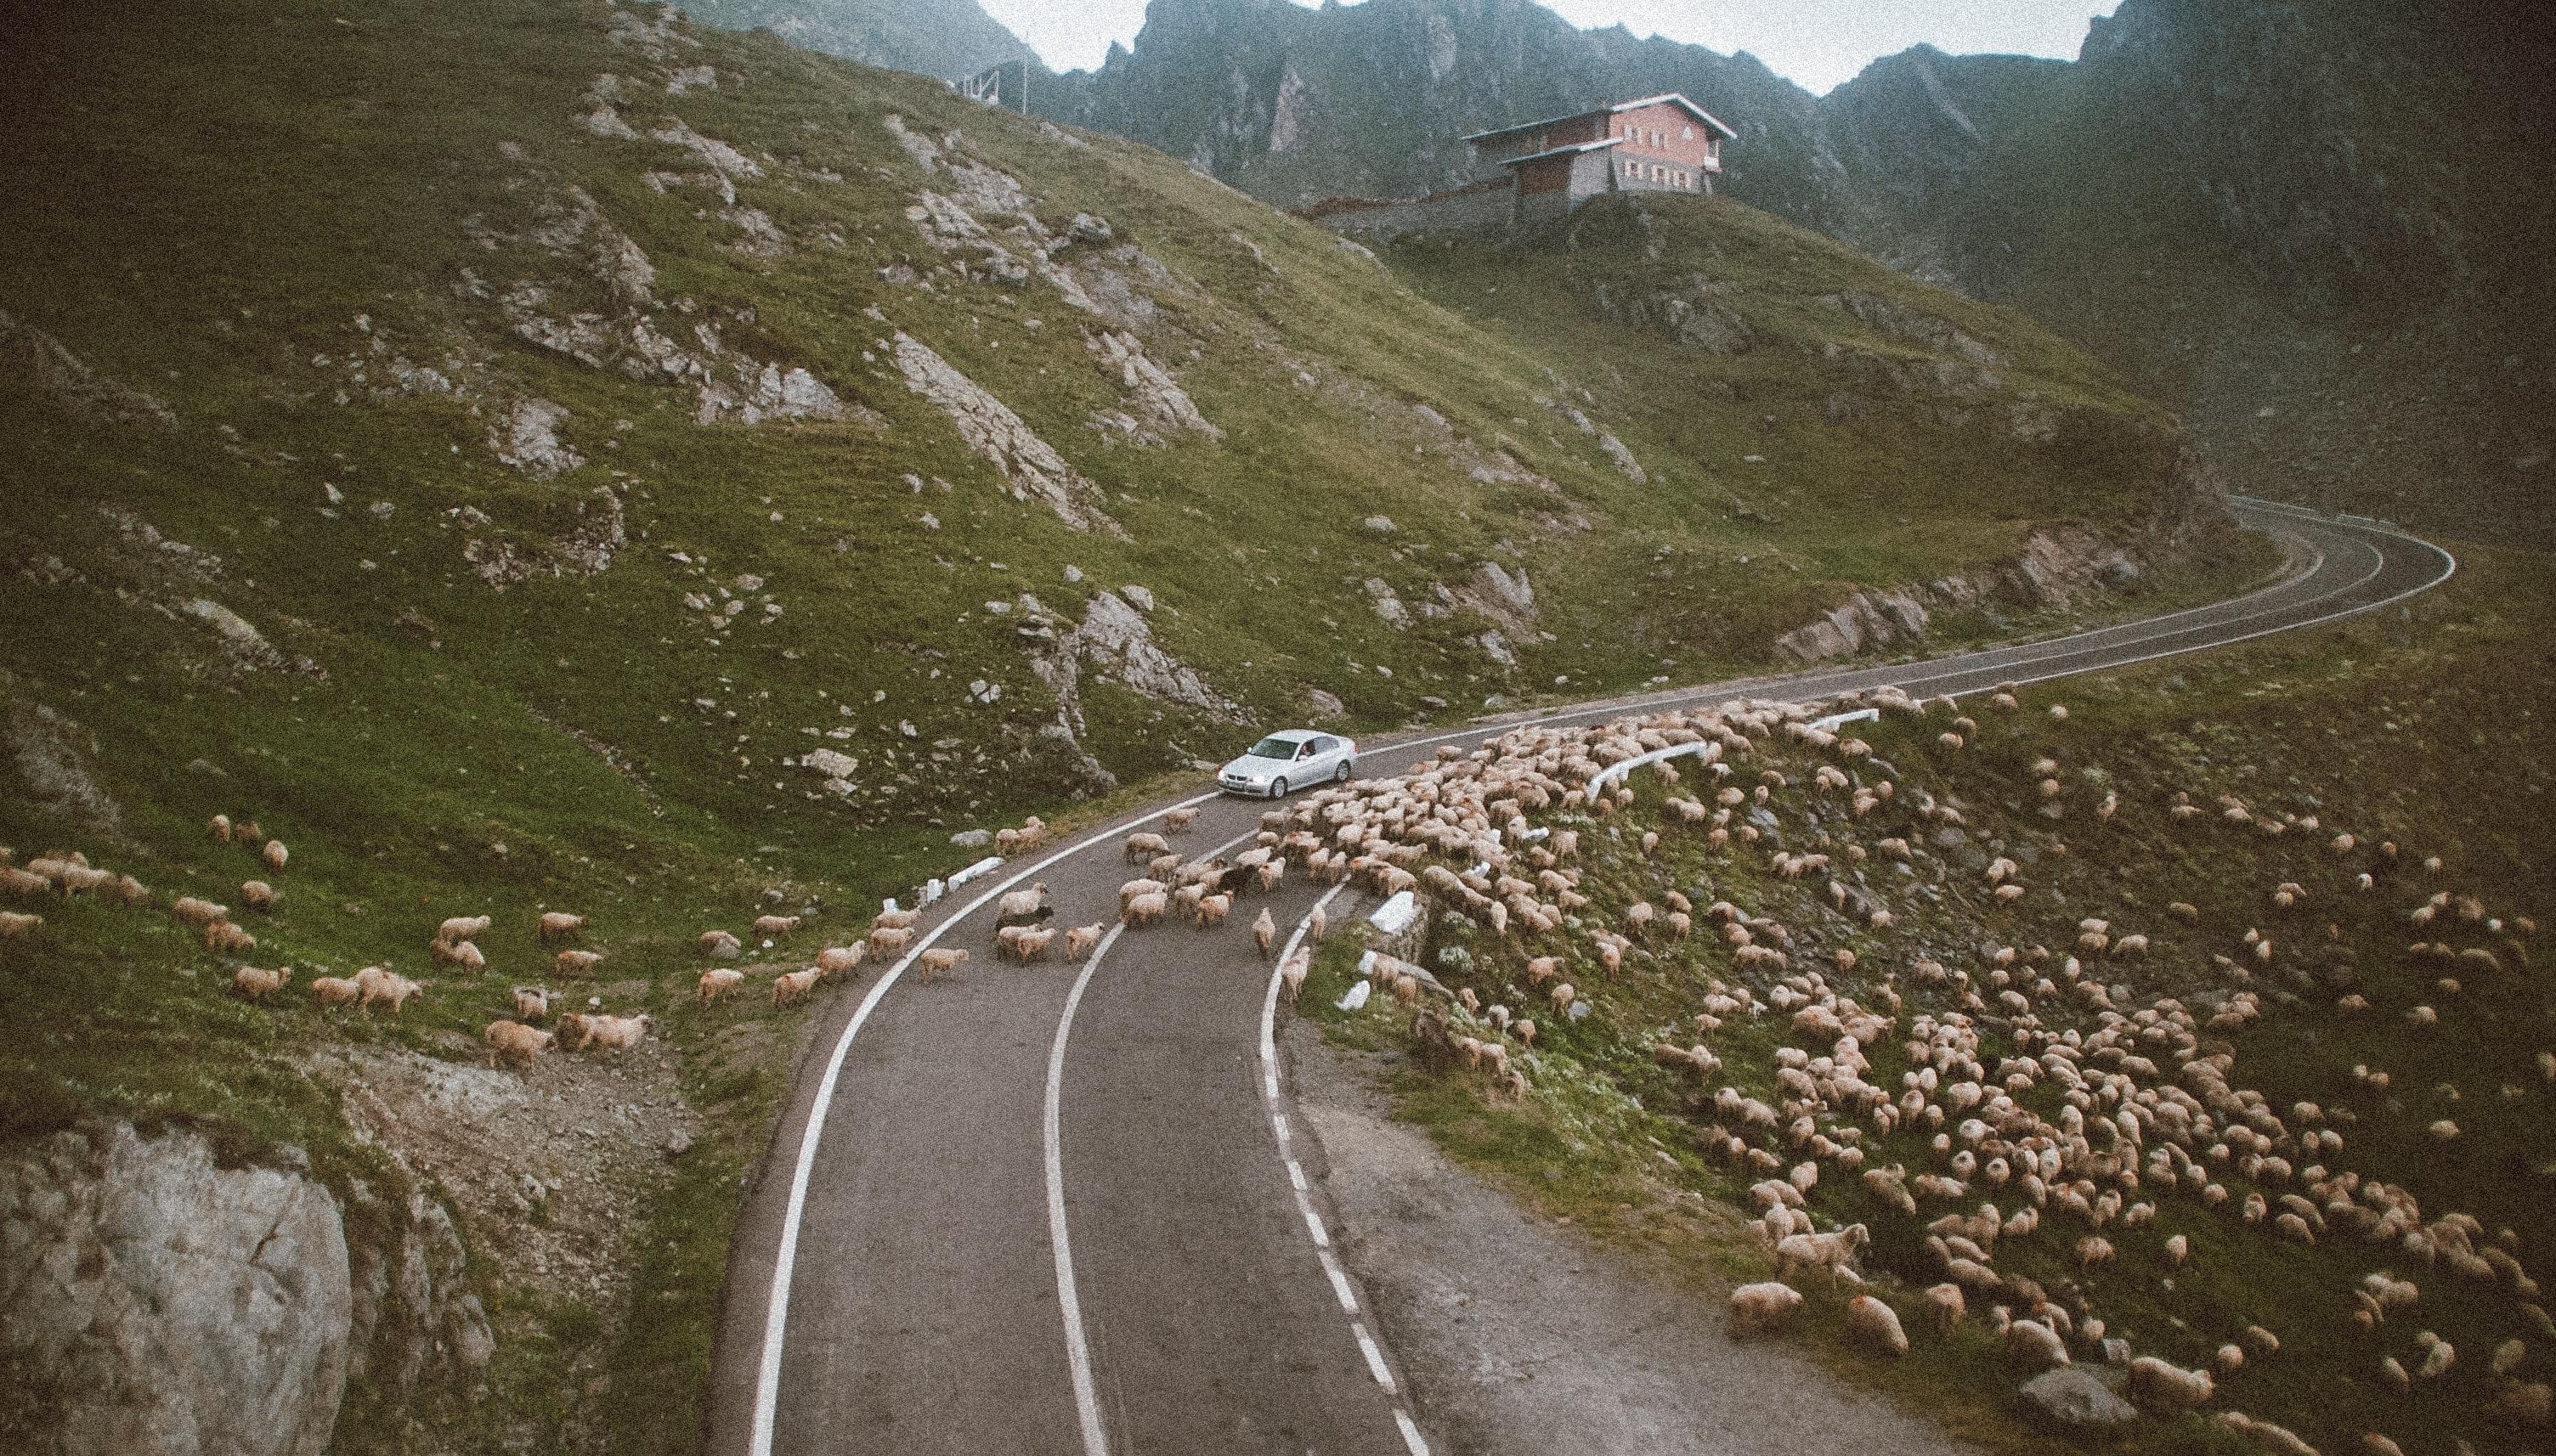 Sheep and cars